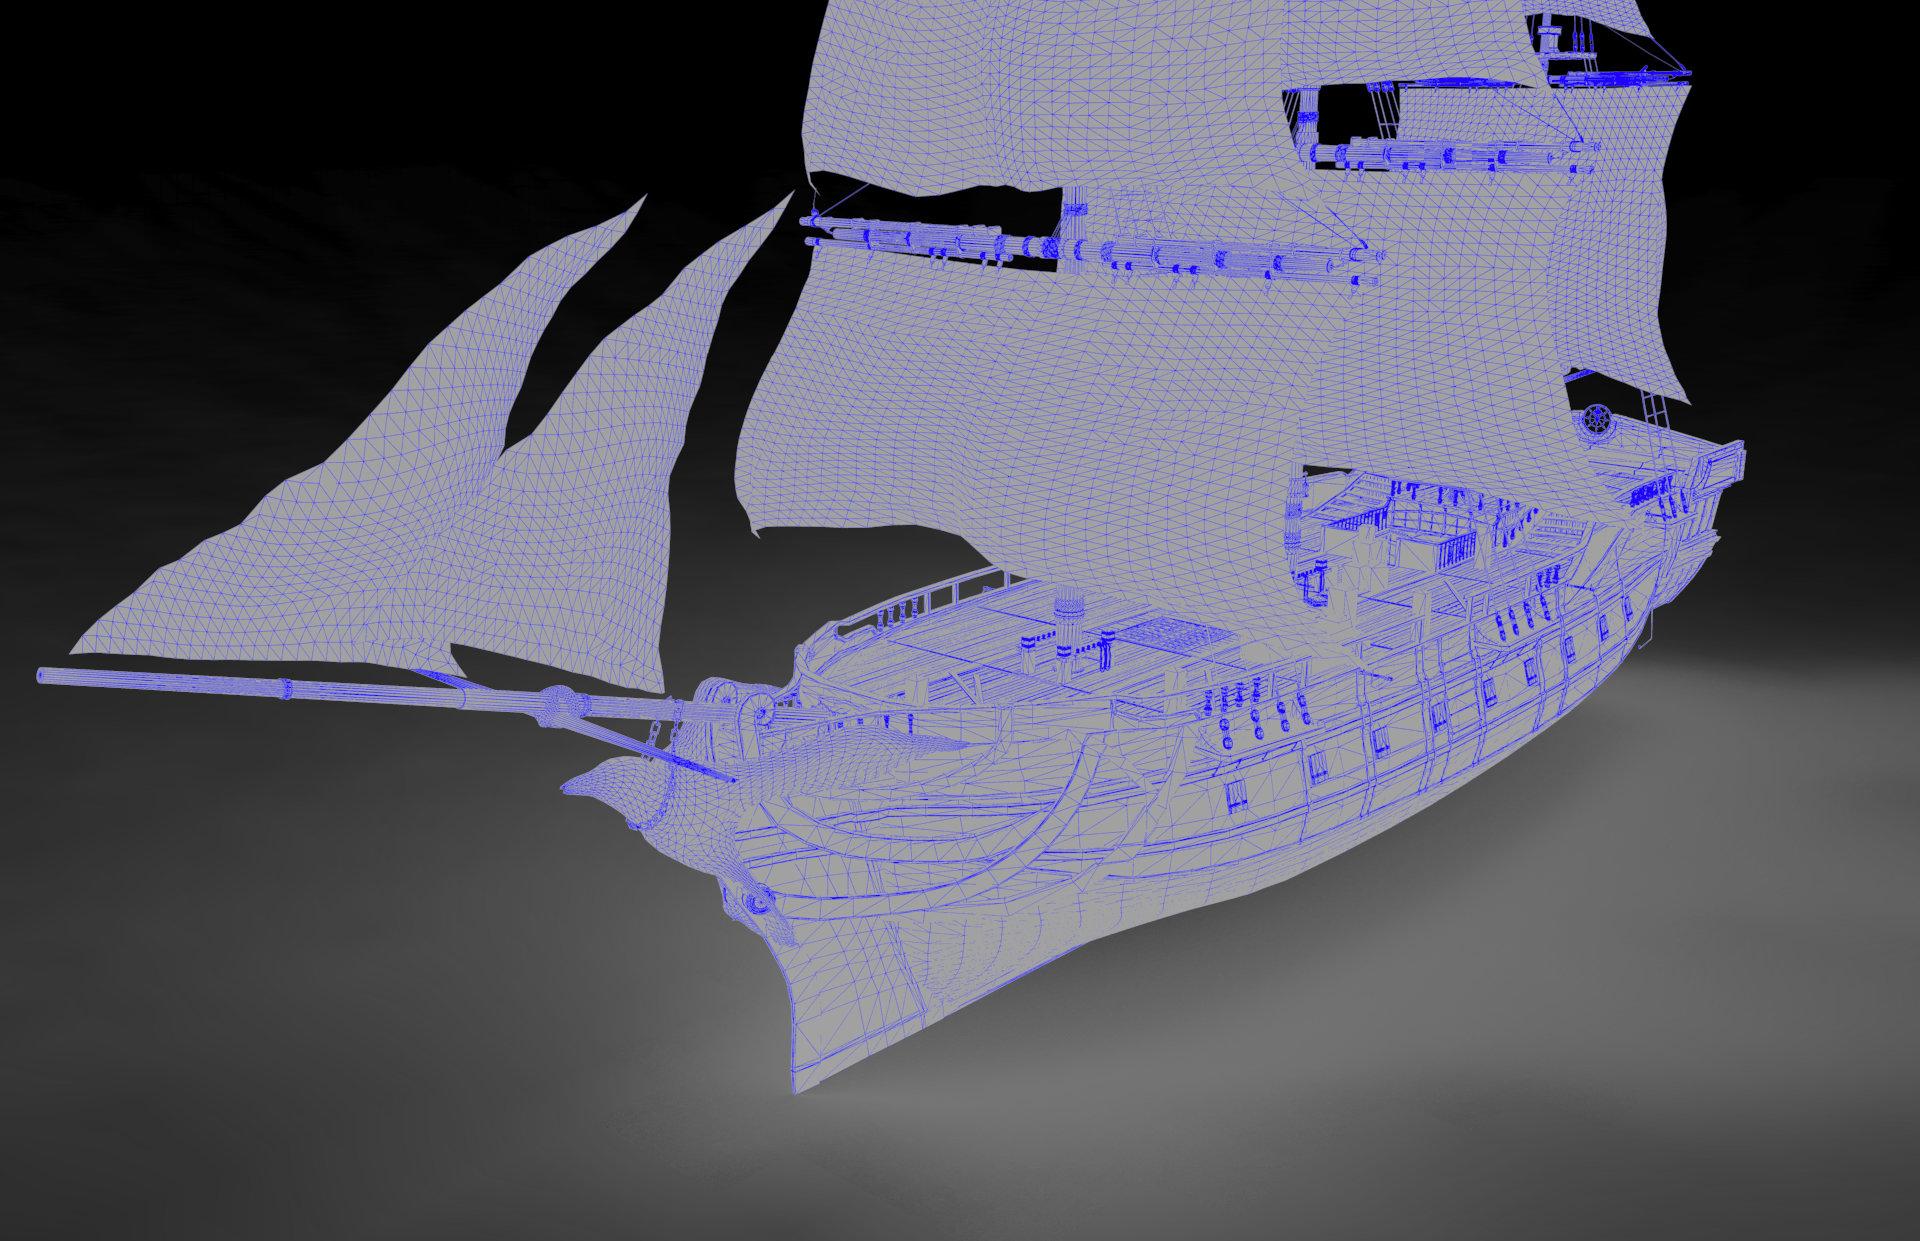 David nicholls boat matte 3